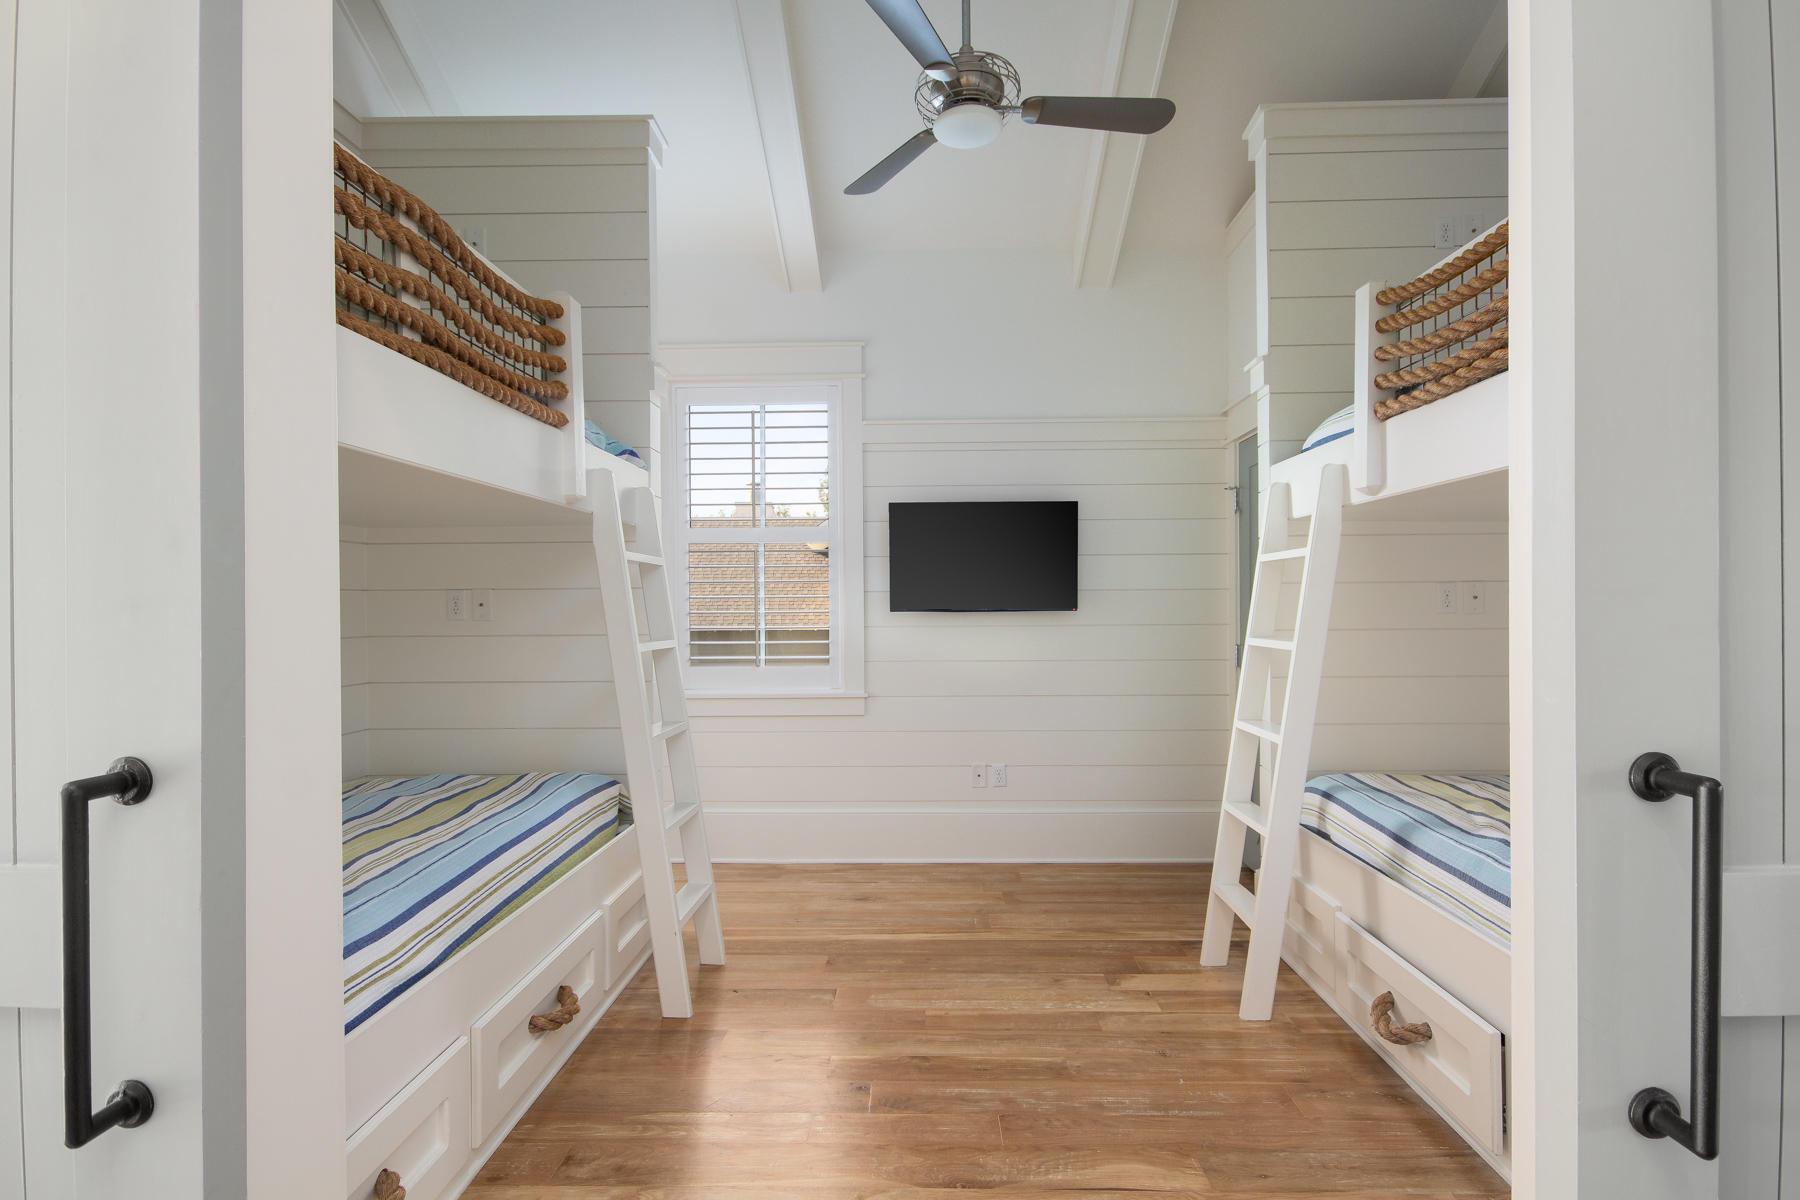 23 Salt Box,Watersound,Florida 32461,4 Bedrooms Bedrooms,4 BathroomsBathrooms,Detached single family,Salt Box,20131126143817002353000000